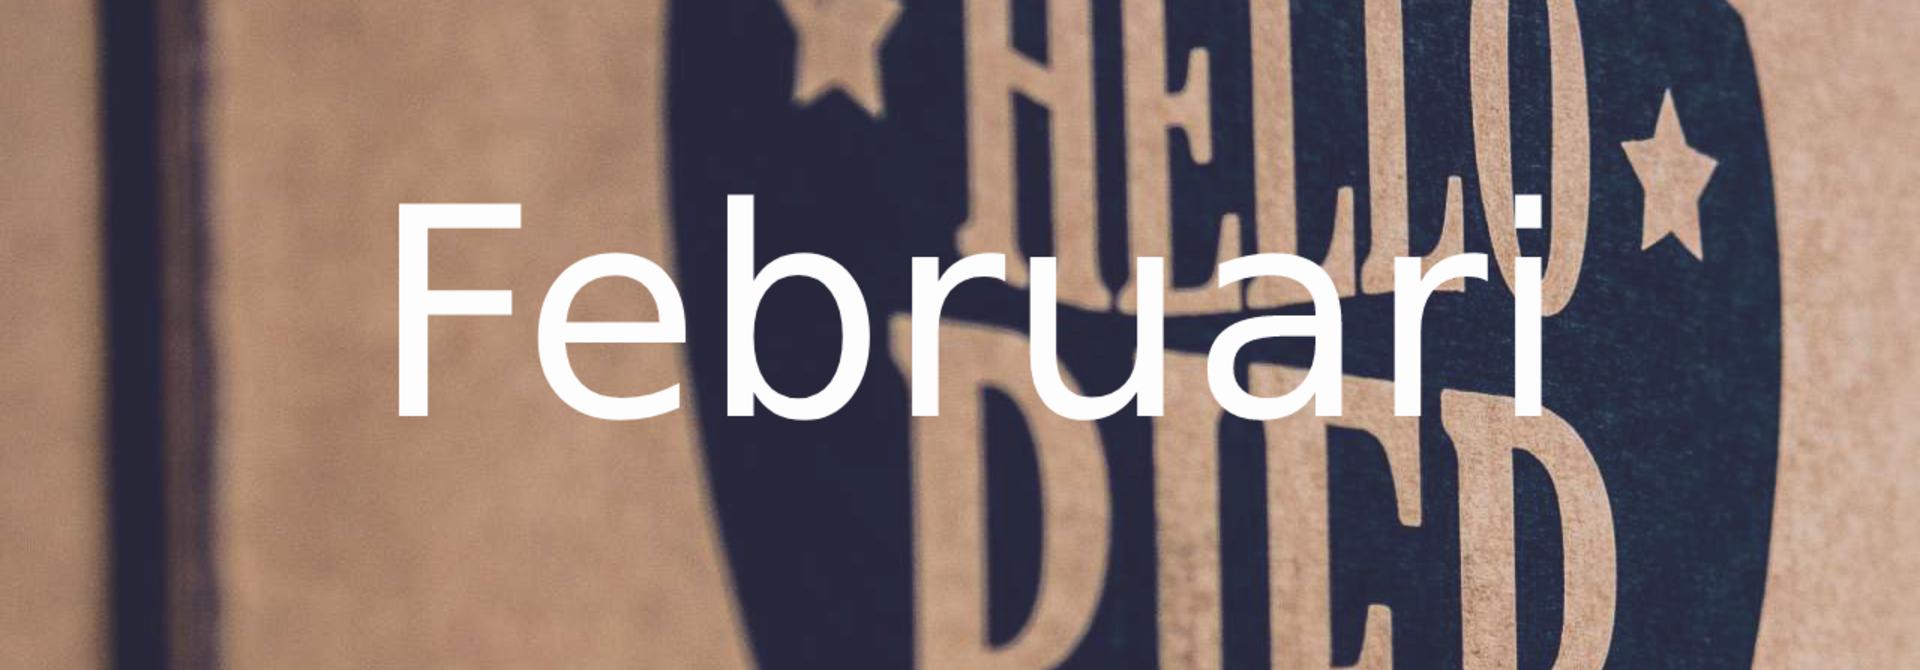 Speciaalbier – bierpakket februari 2019